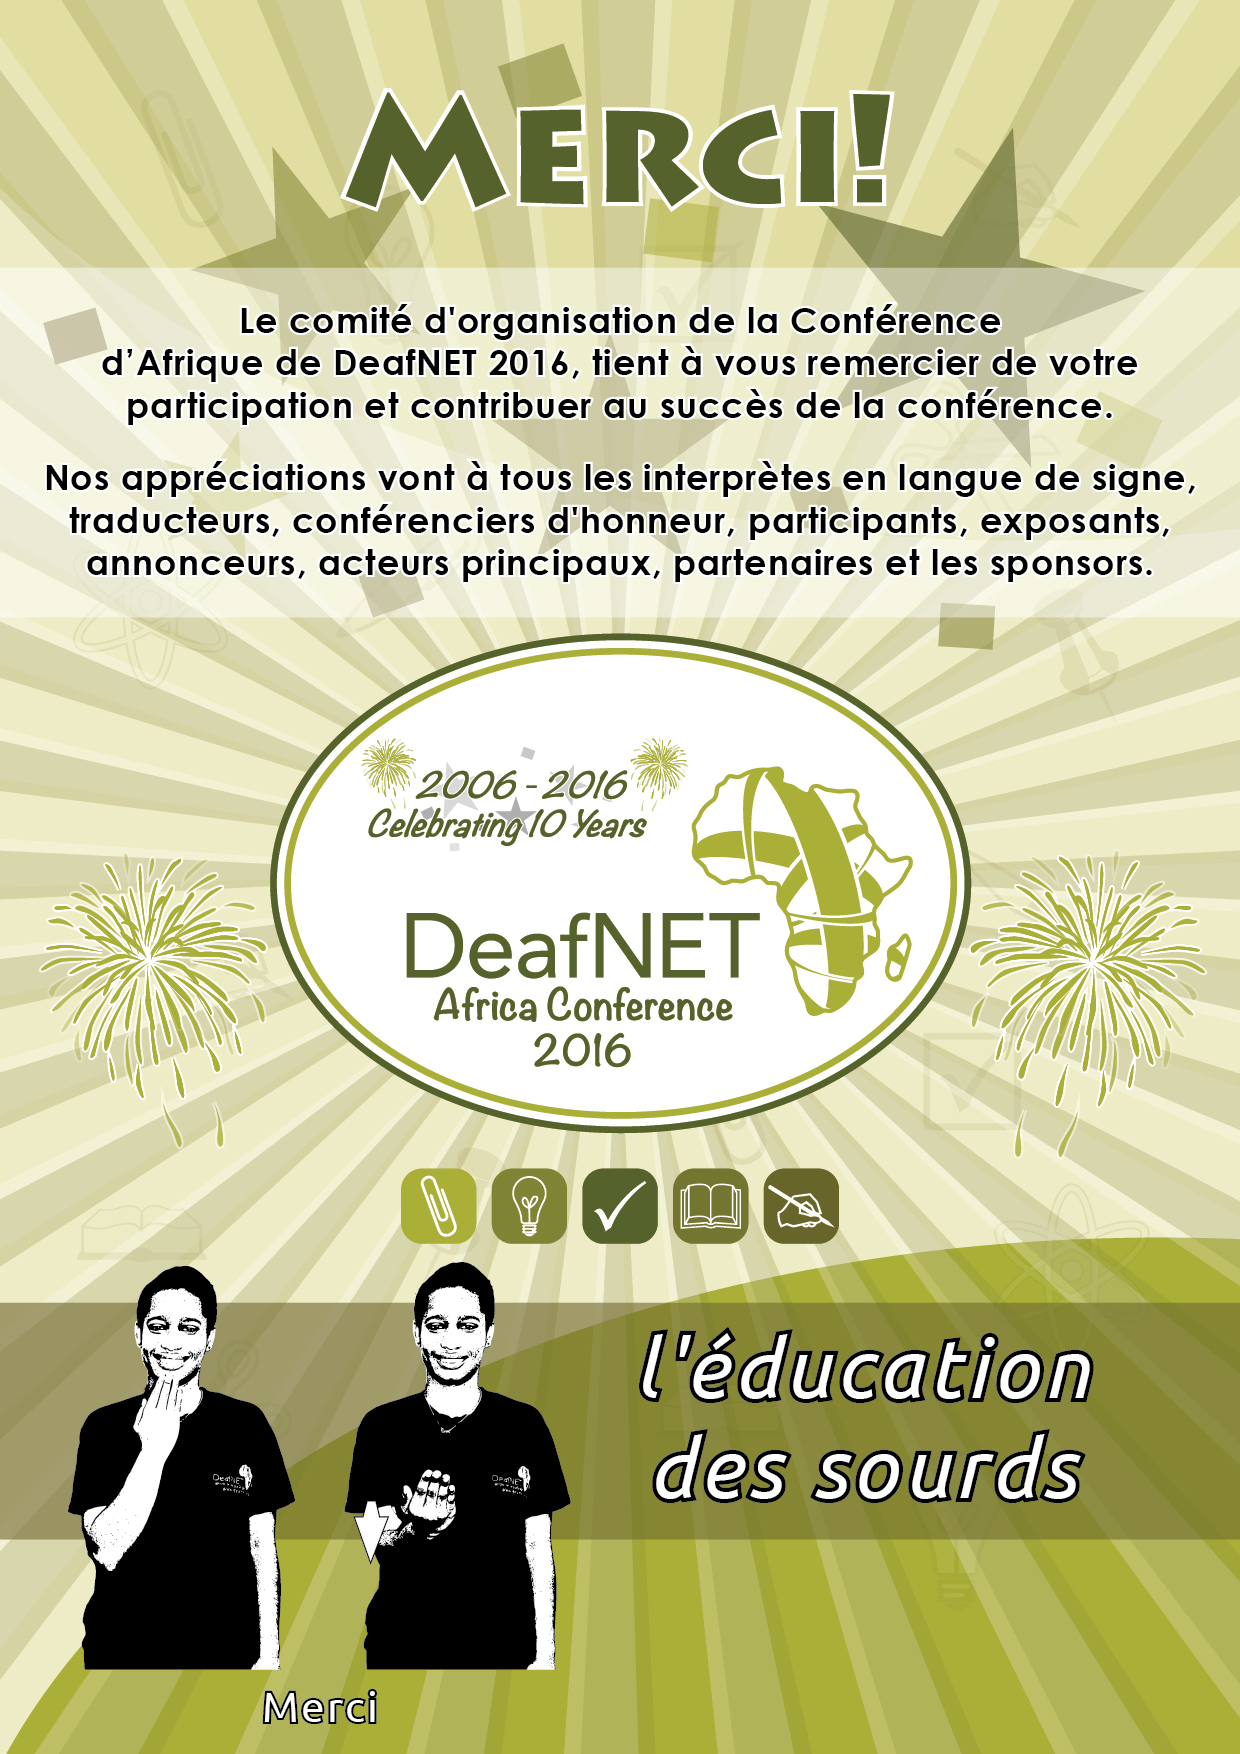 DeafNET 2016 Africa Conference MERCI